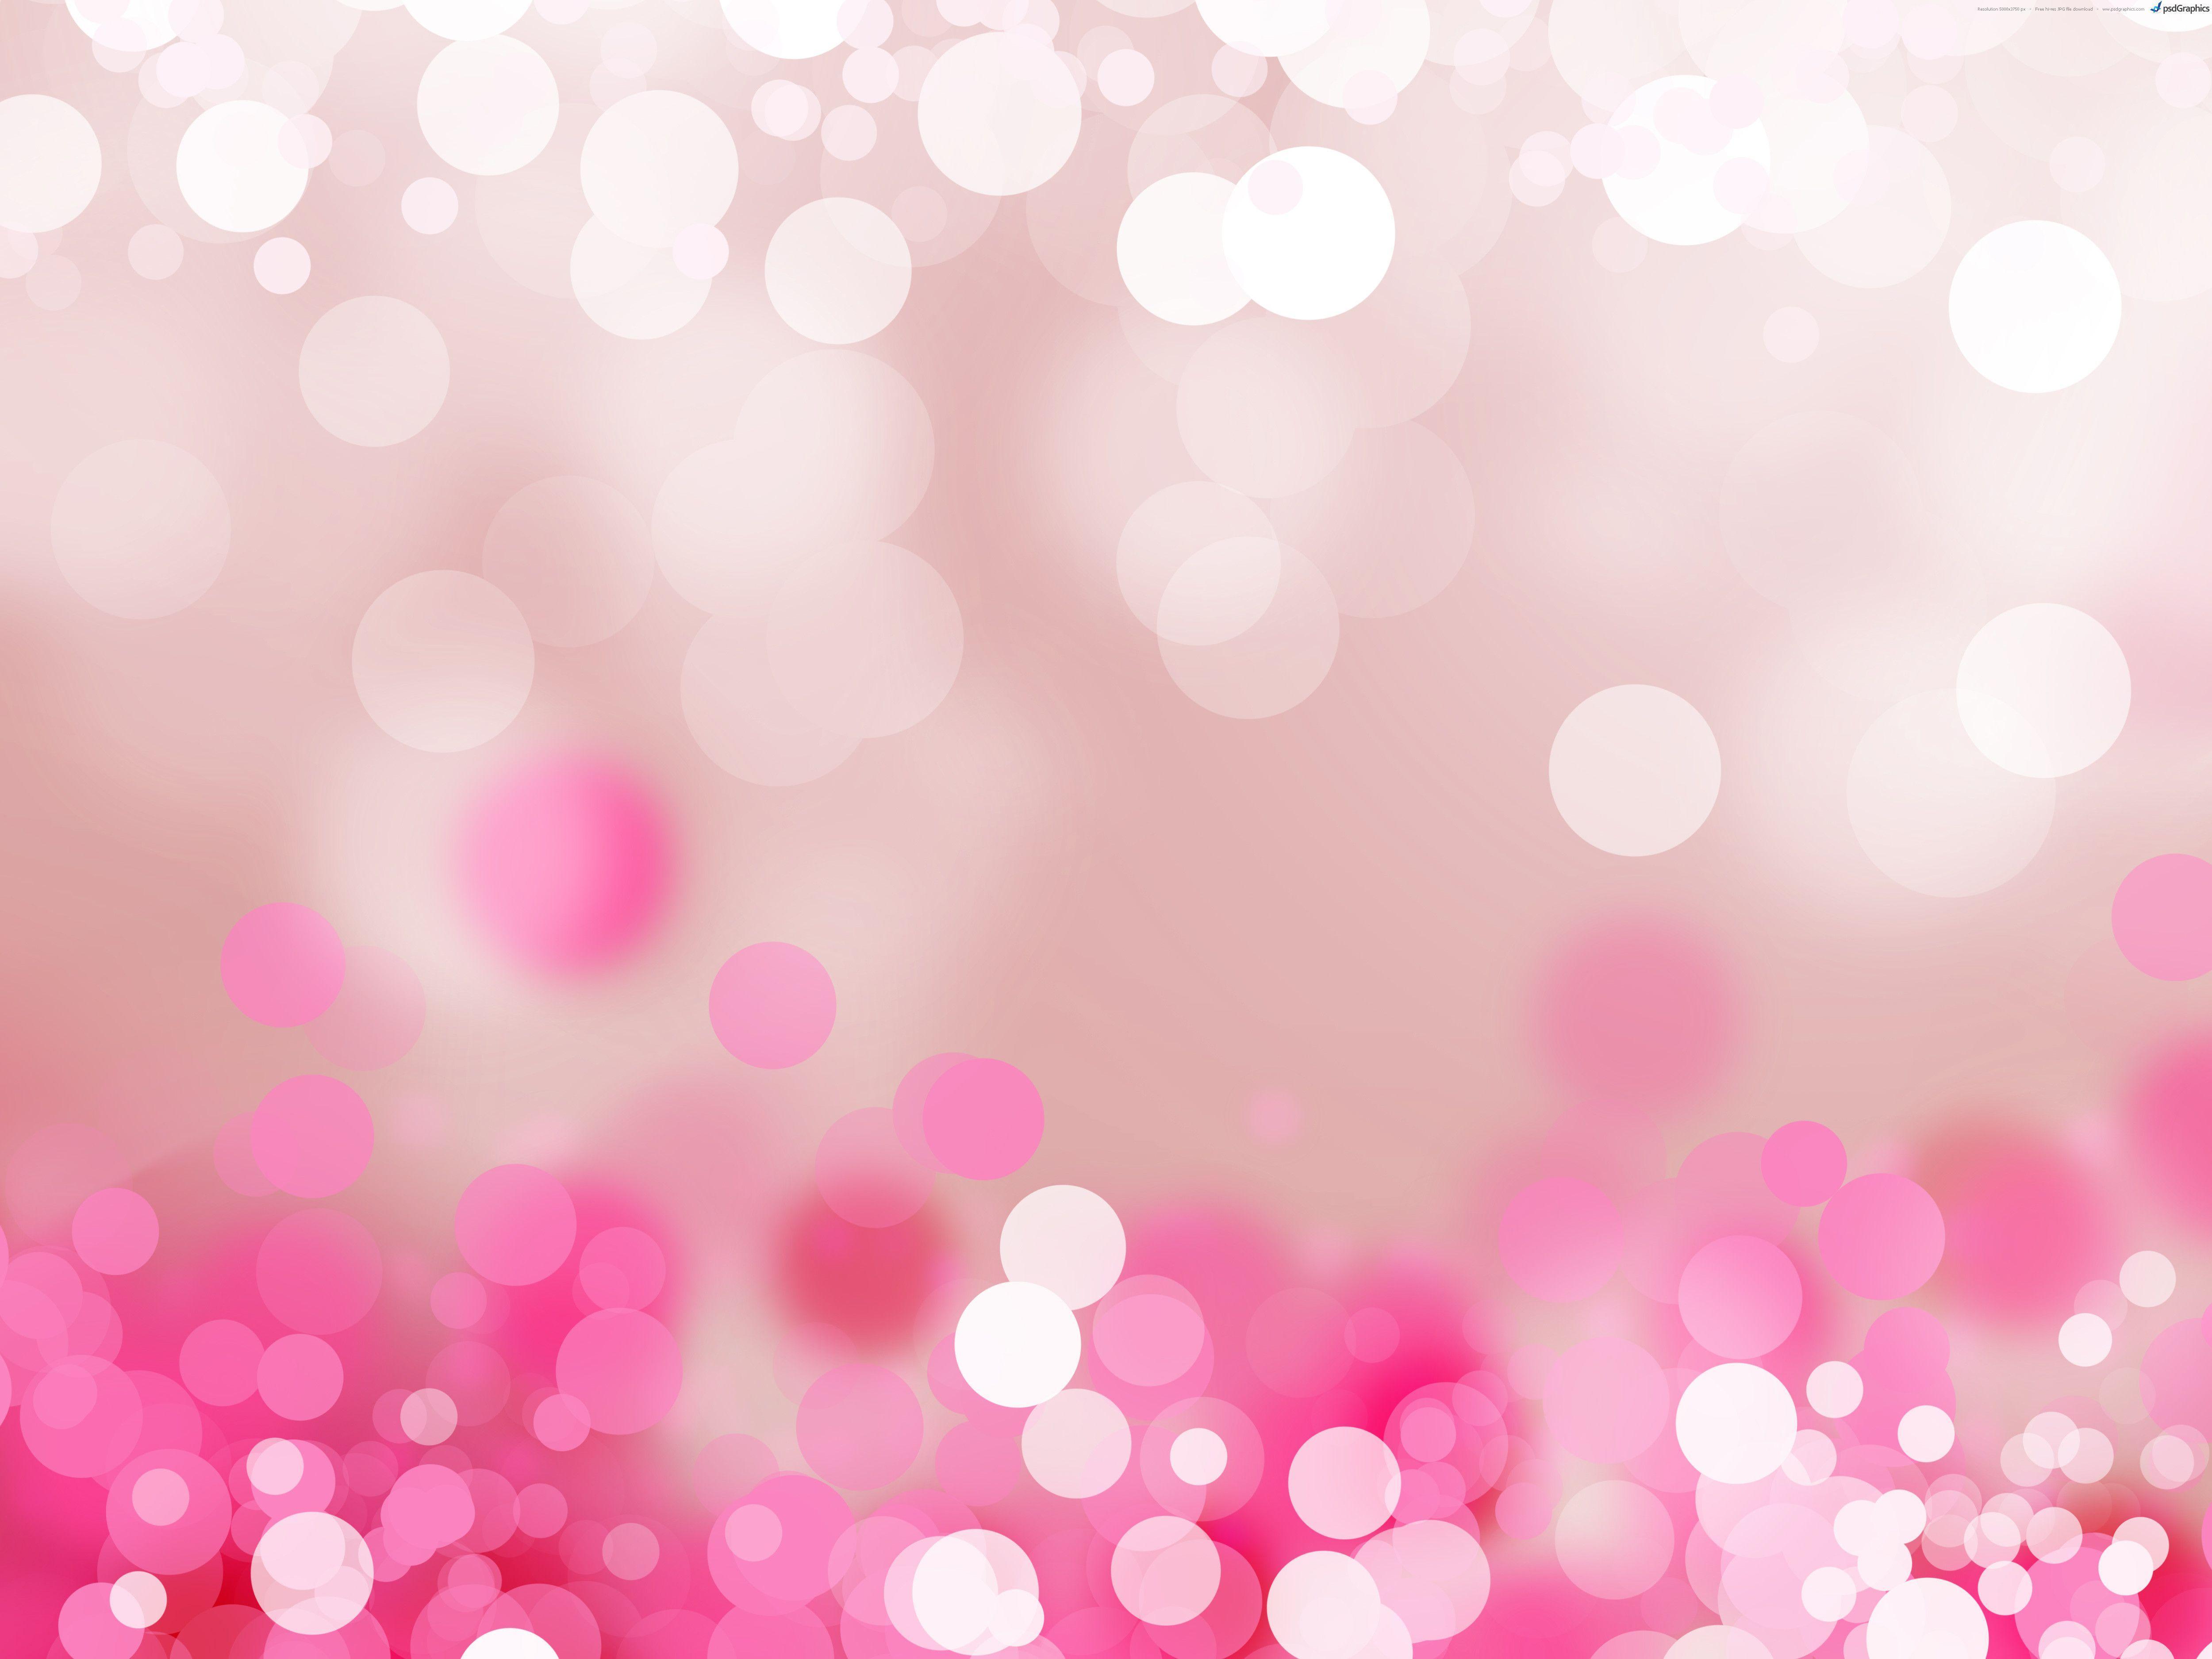 Golden State Warriors Wallpaper Hd Rose Pink Backgrounds Wallpaper Cave